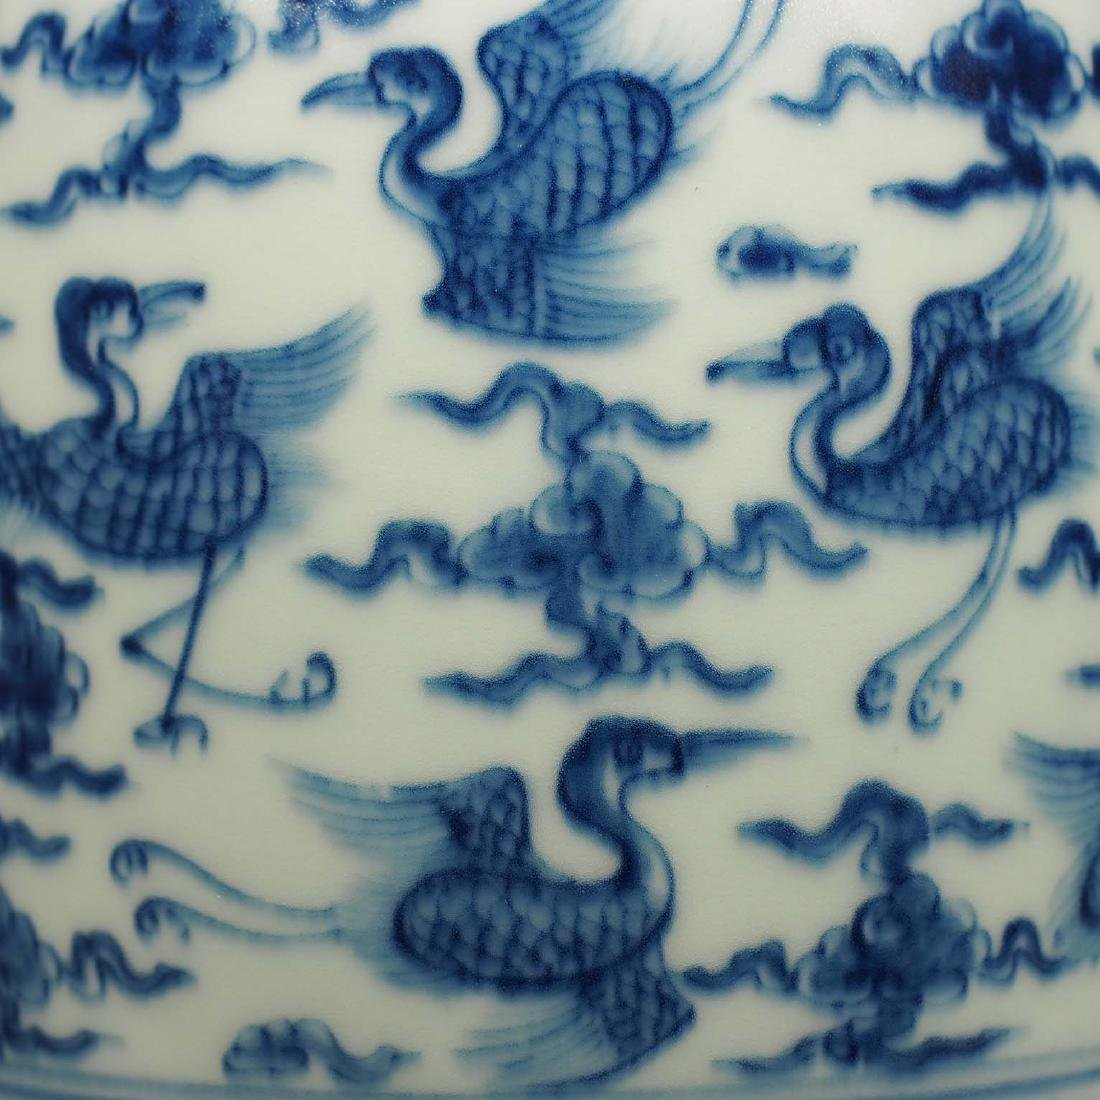 Vase with Flying Cranes Design, Ming Dynasty - 3